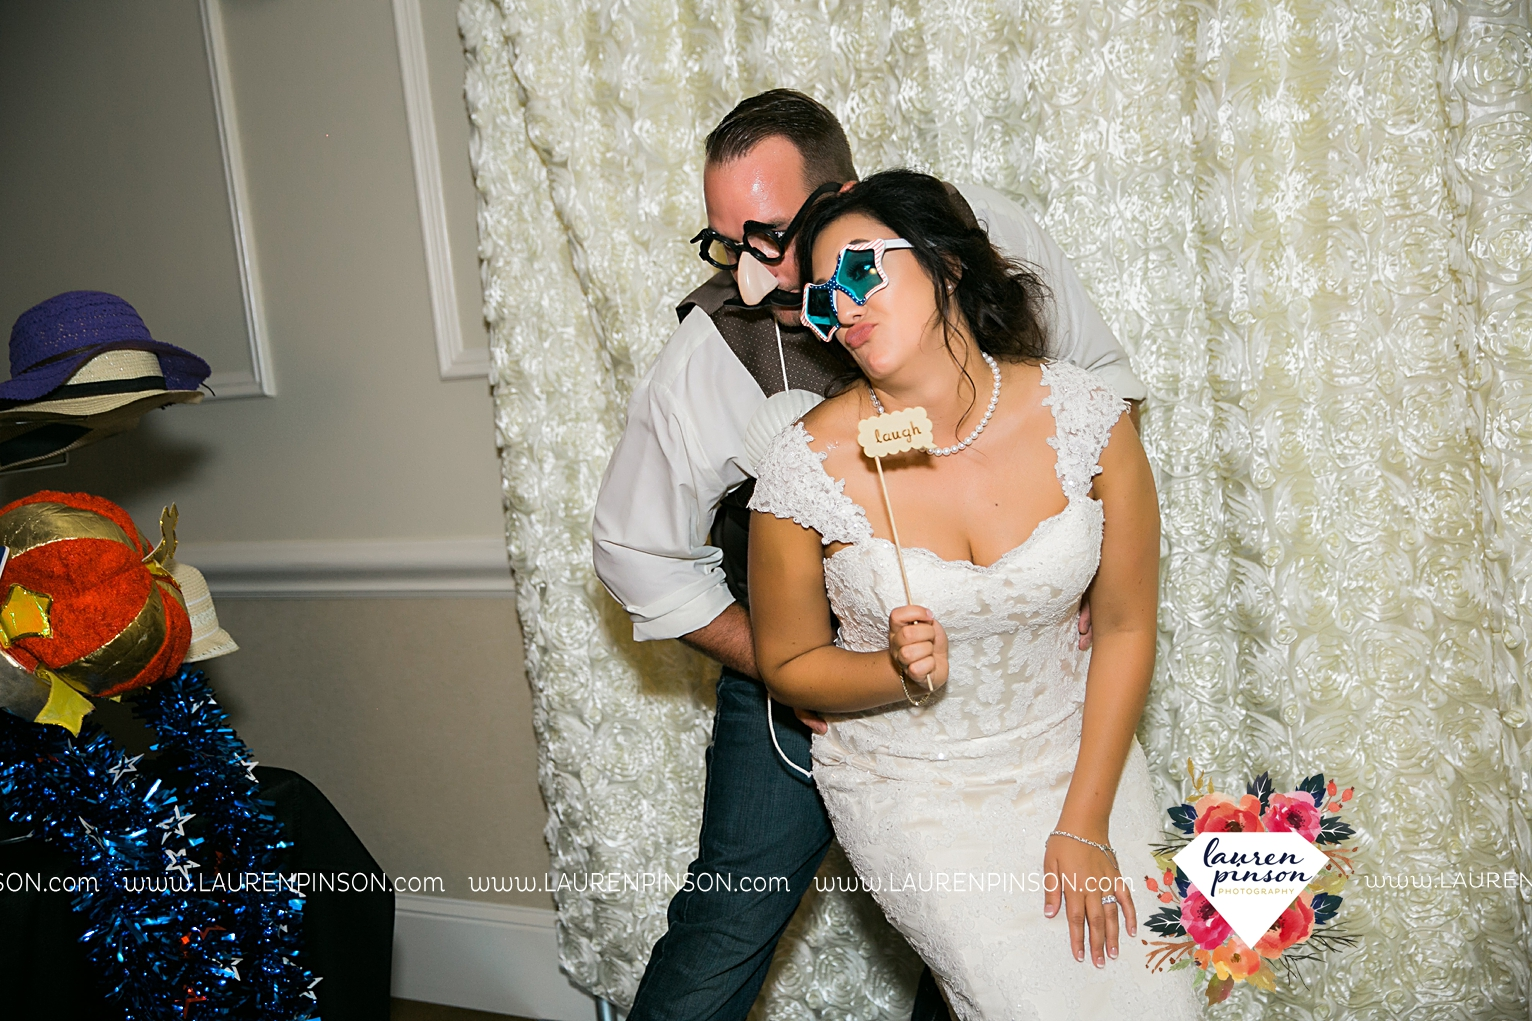 wichita-falls-texas-wedding-photographer-wellington-on-the-lake-with-mayfield-events_2992.jpg